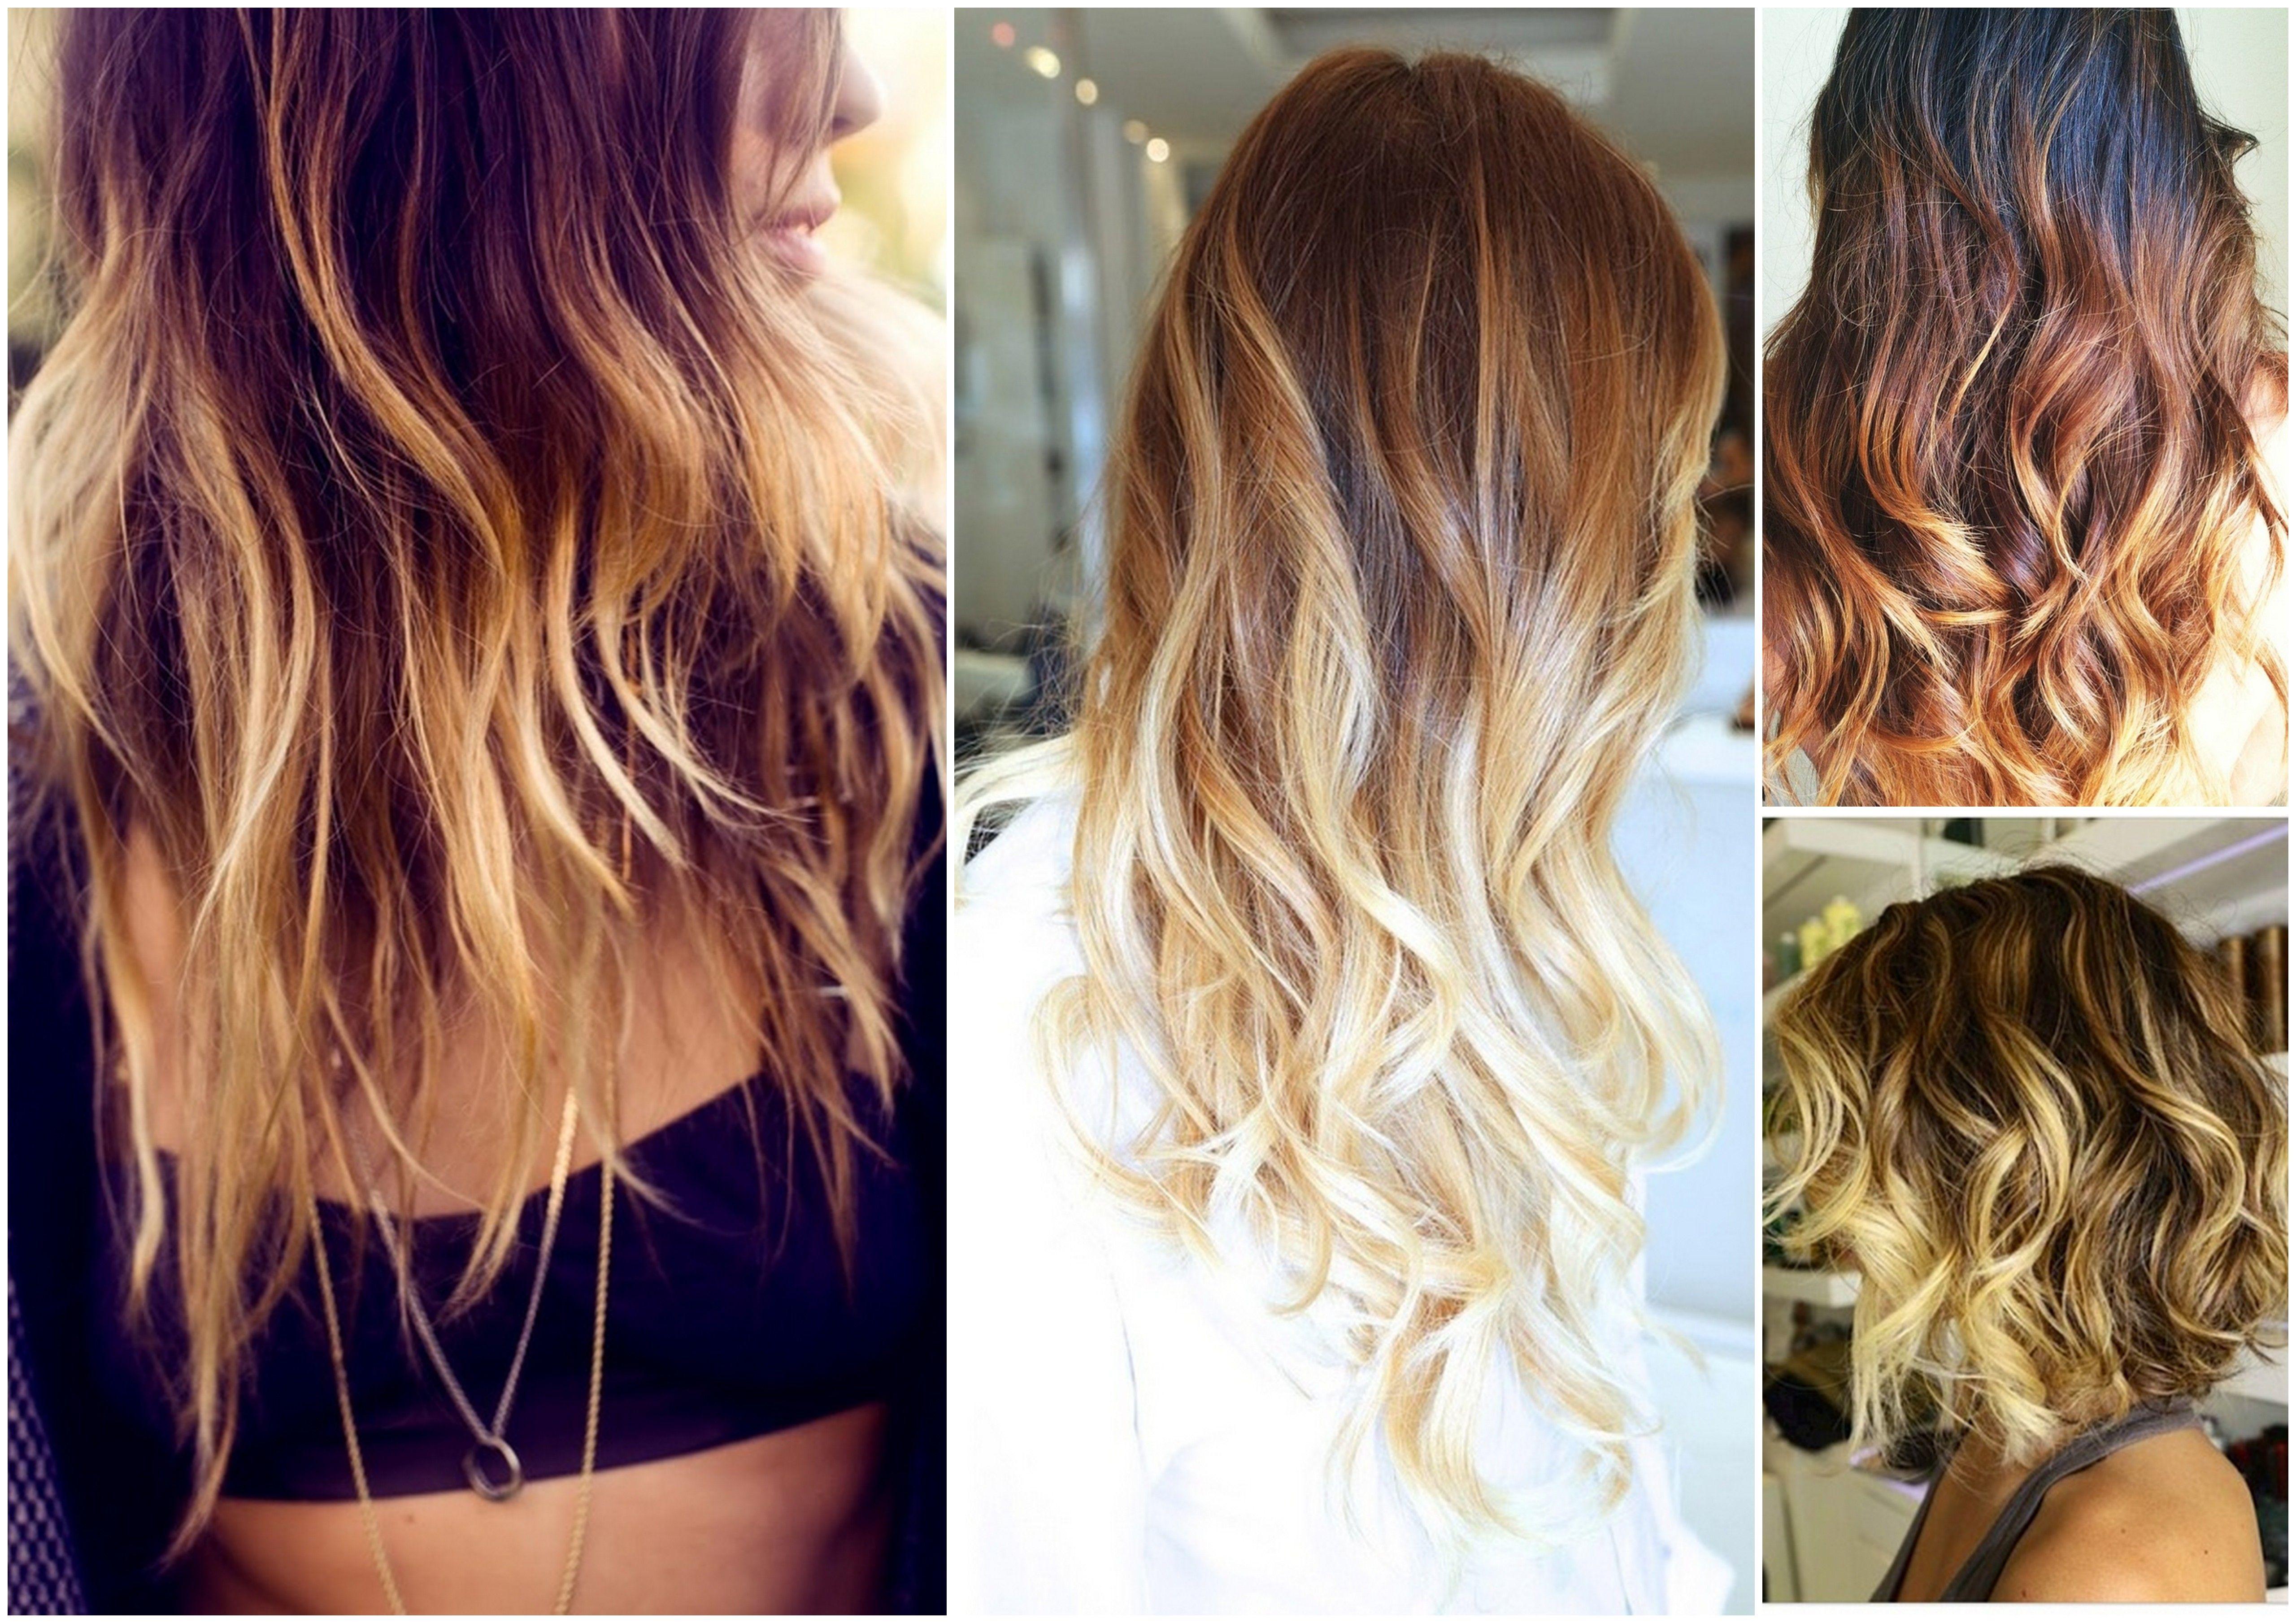 Mymondaylook The Ombr Hairstyles Pinterest Surfer Girl Hair